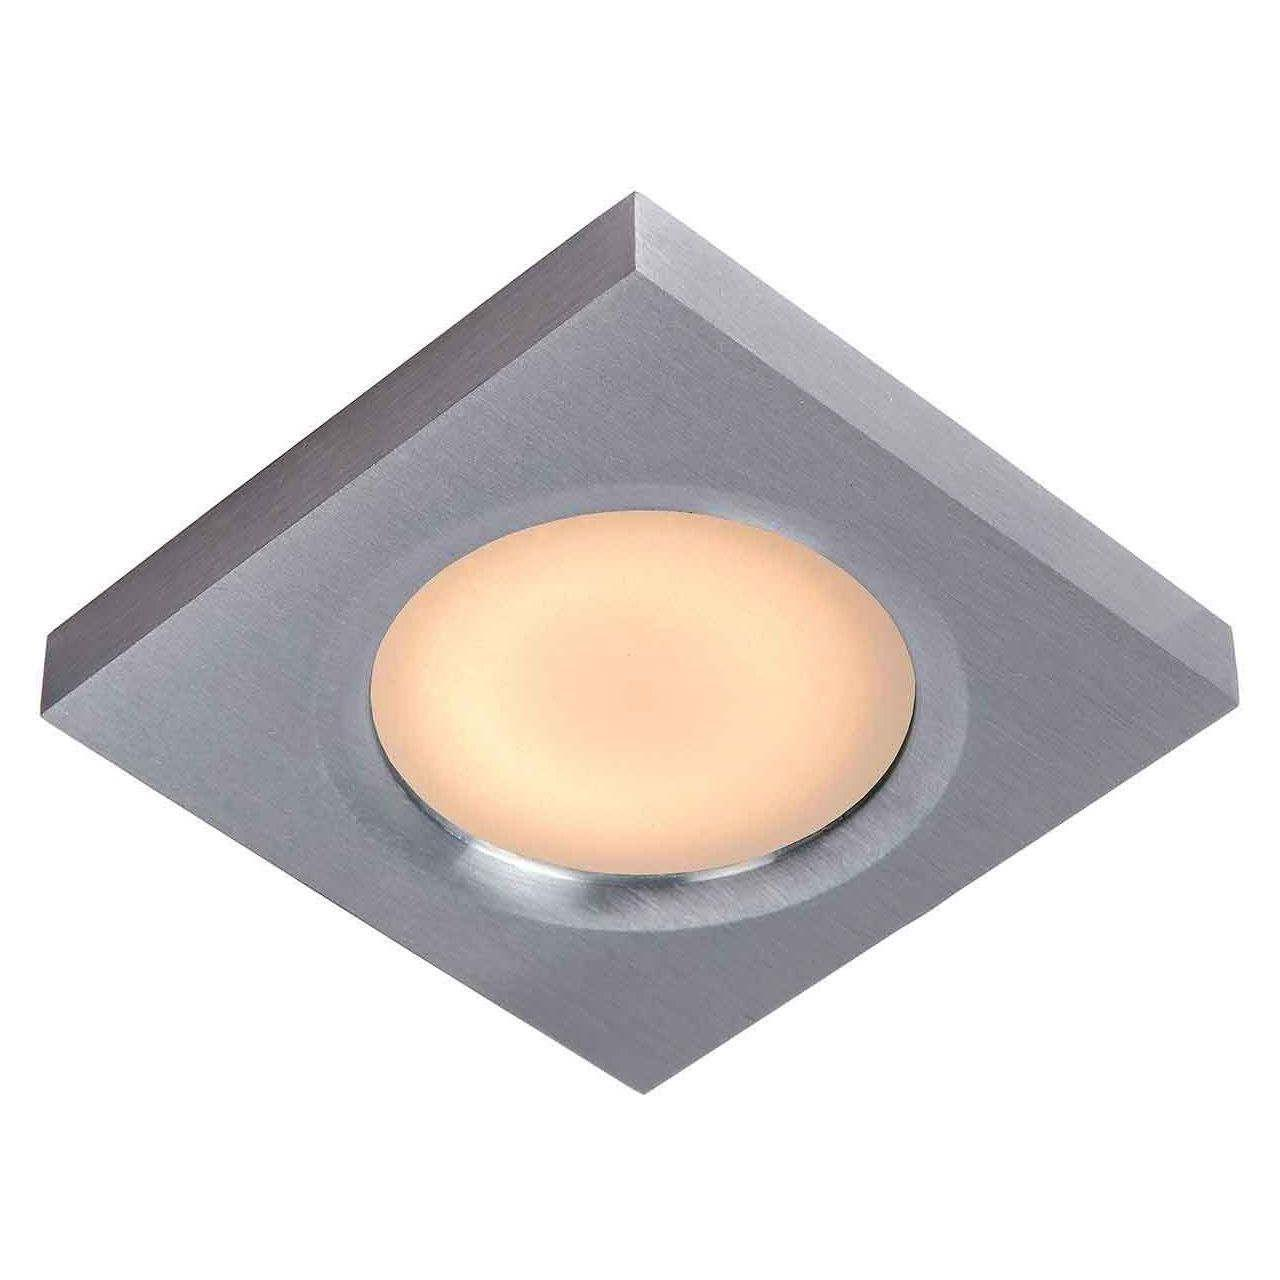 Уличный светильник Lucide Hahne 17107/01/12 150x650mm 4mm thickness uv quartz glass for uv lamp